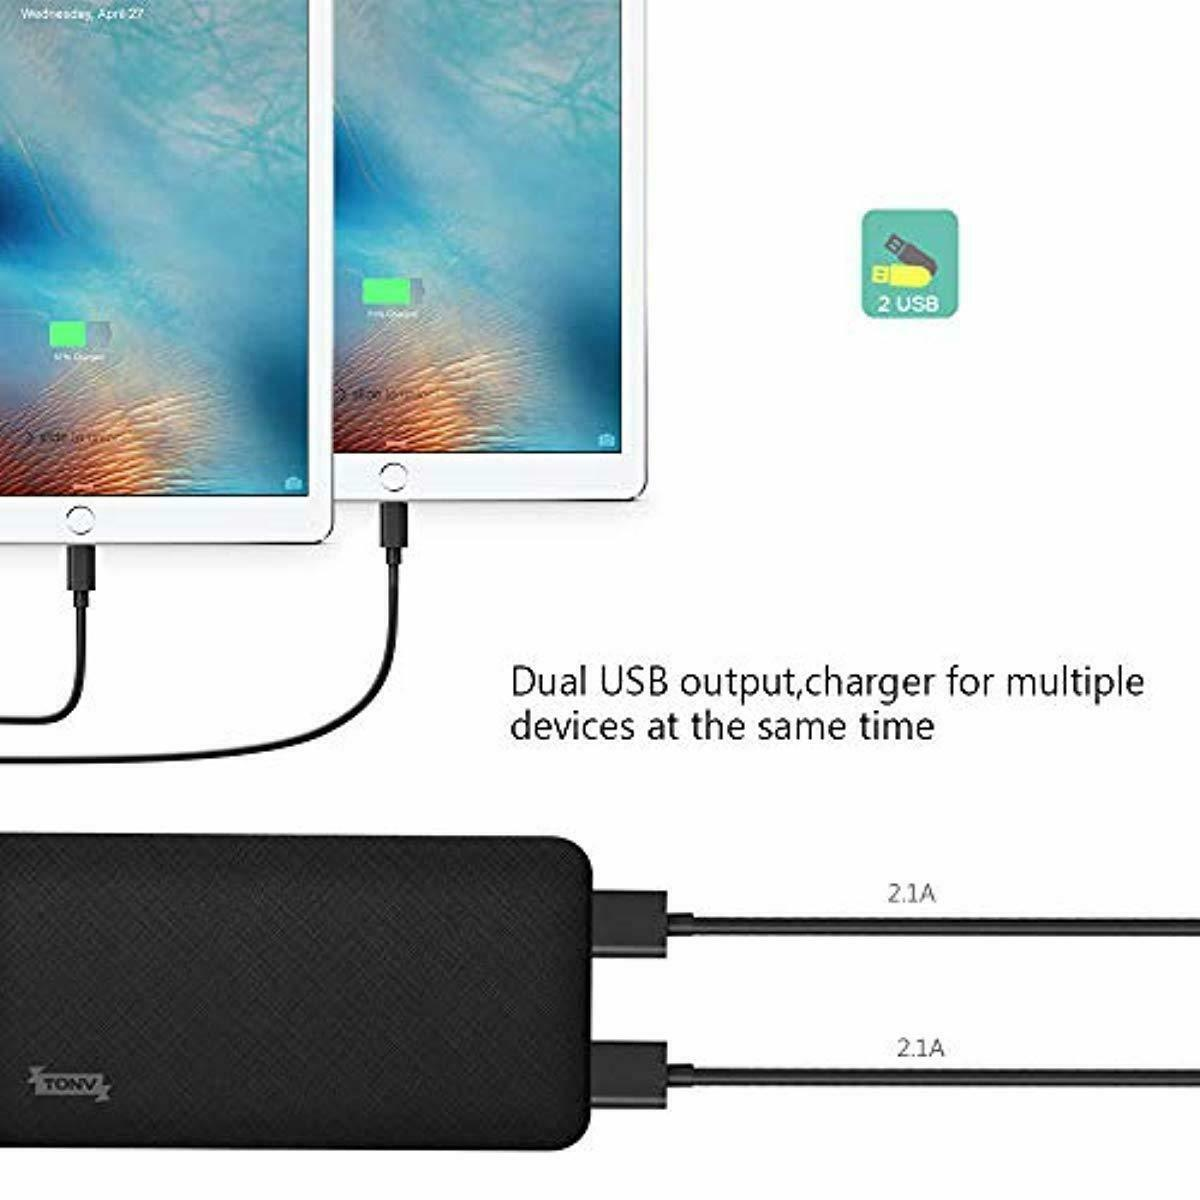 TONV Battery Changer Power Bank 10000mah Compatible with iPhone Ipad Samsung